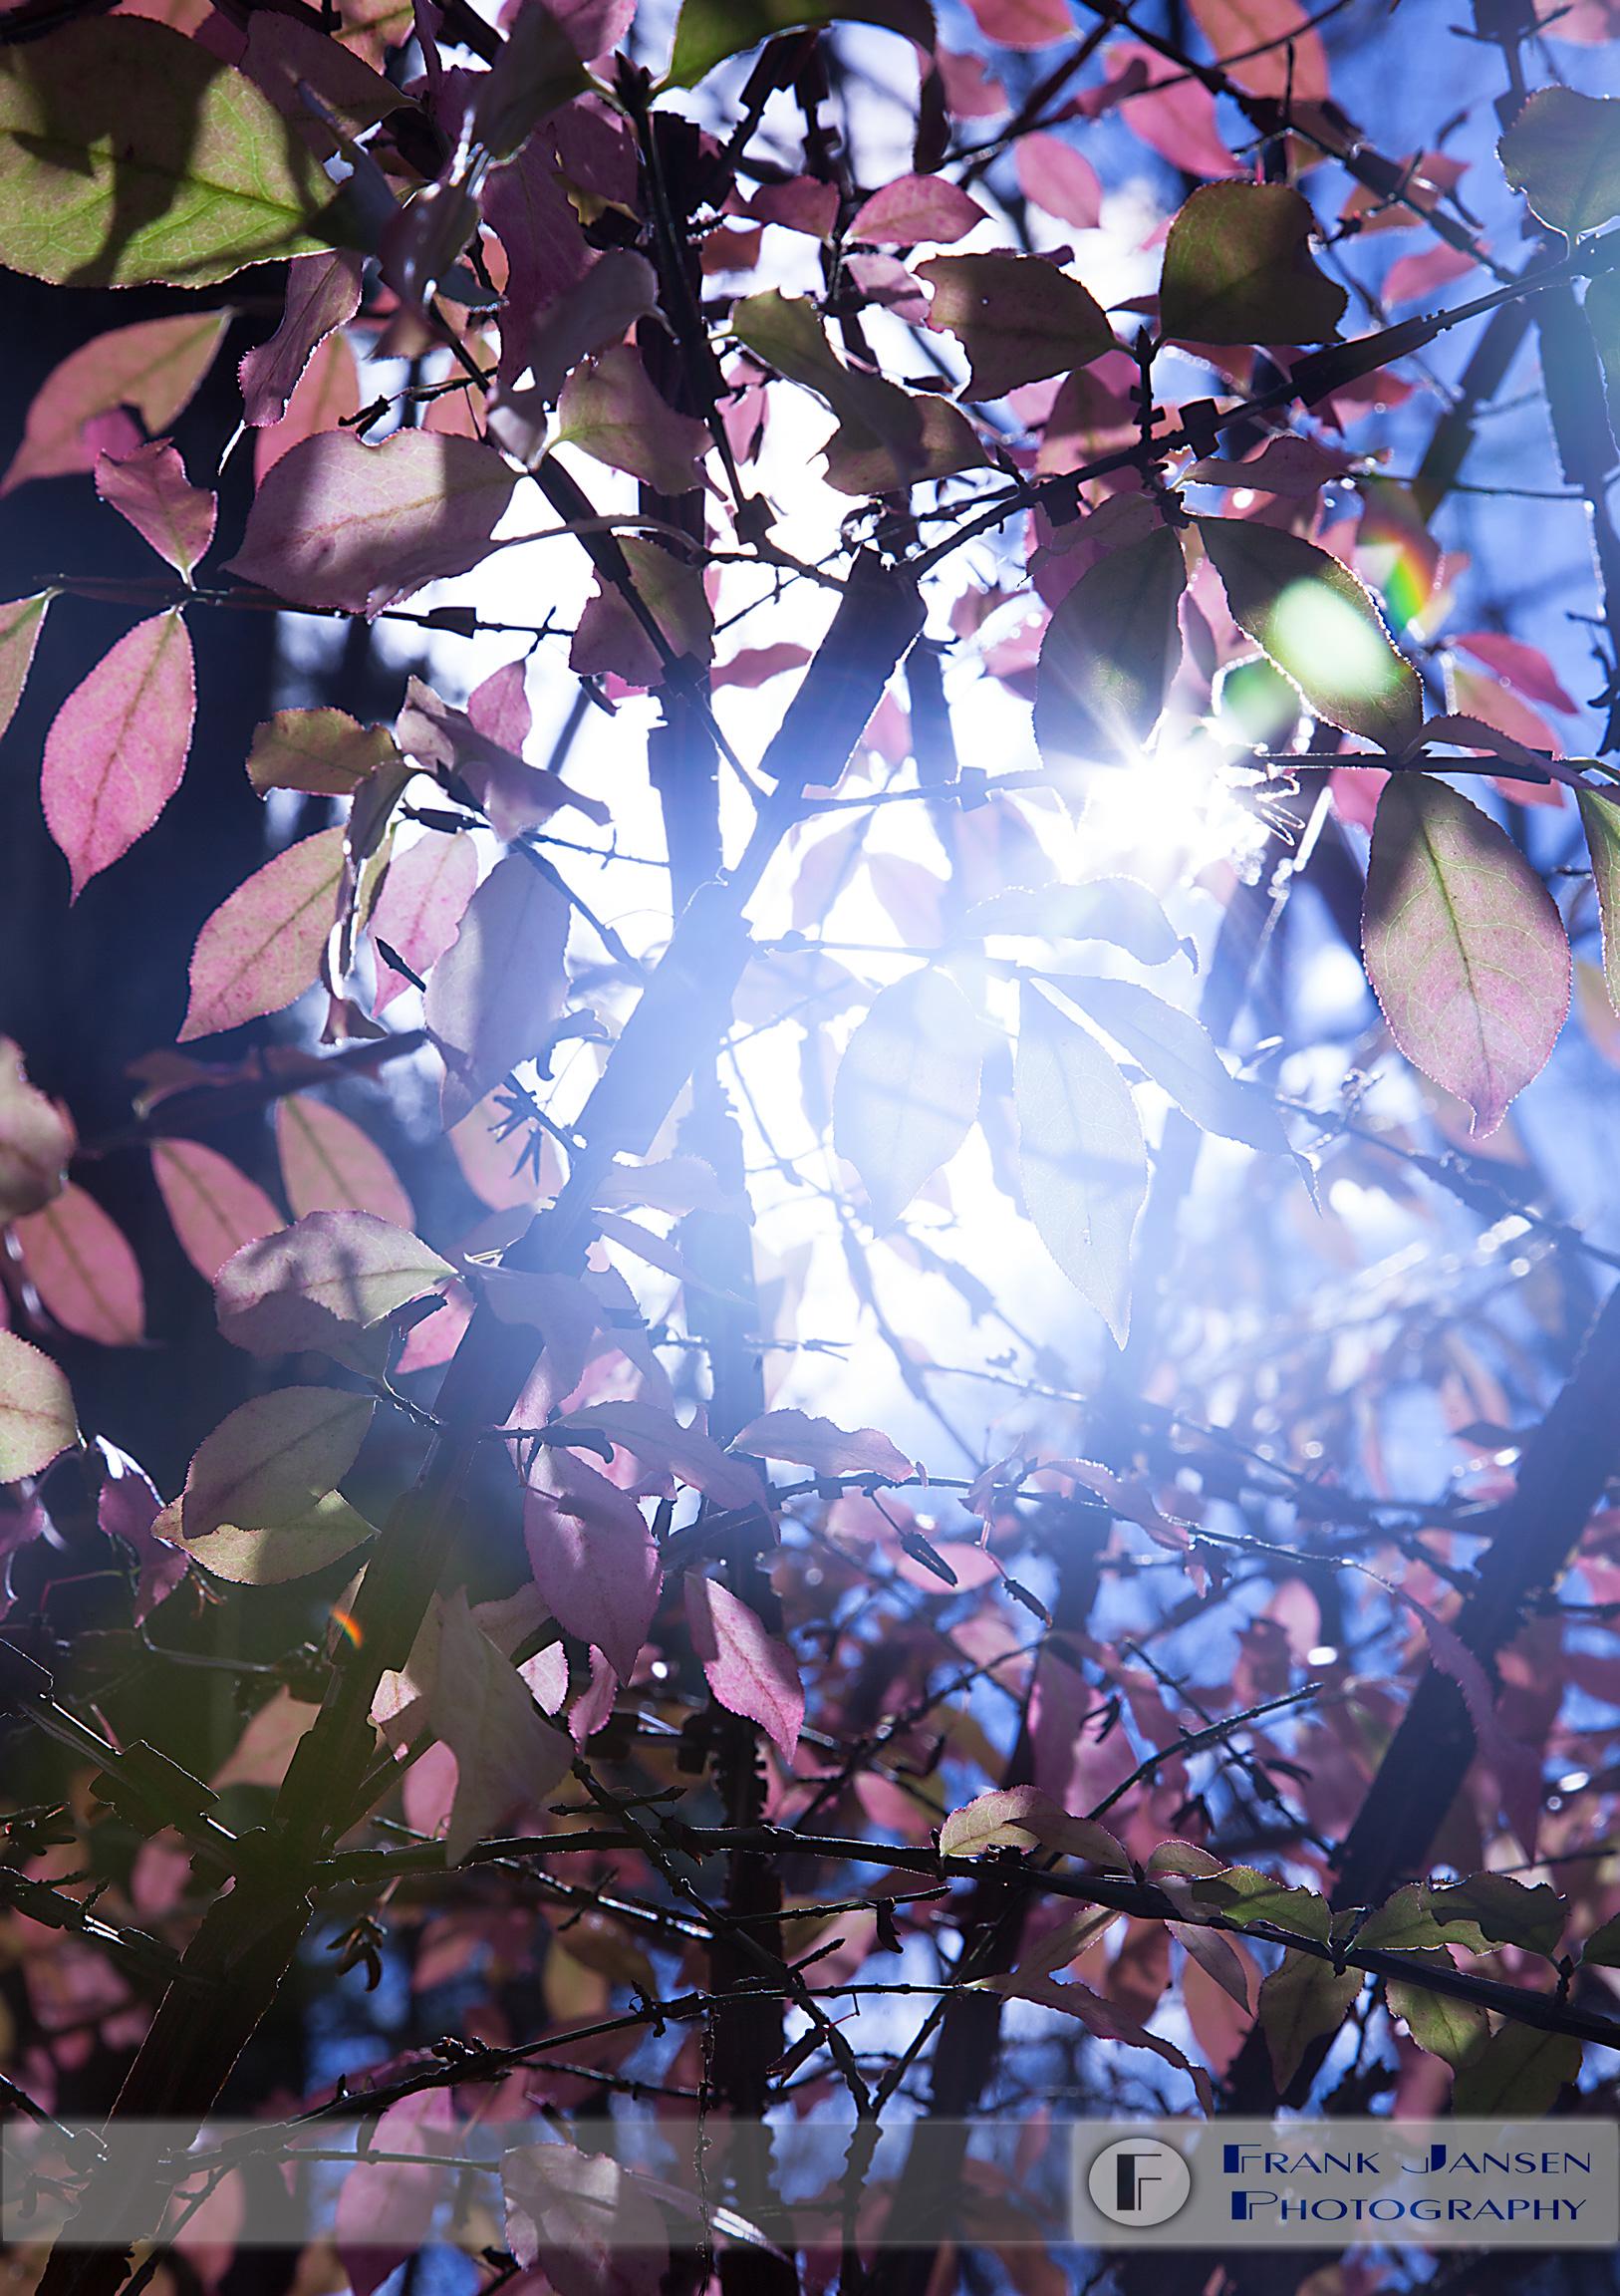 Autumn-Clarity_MG_9688-Crop